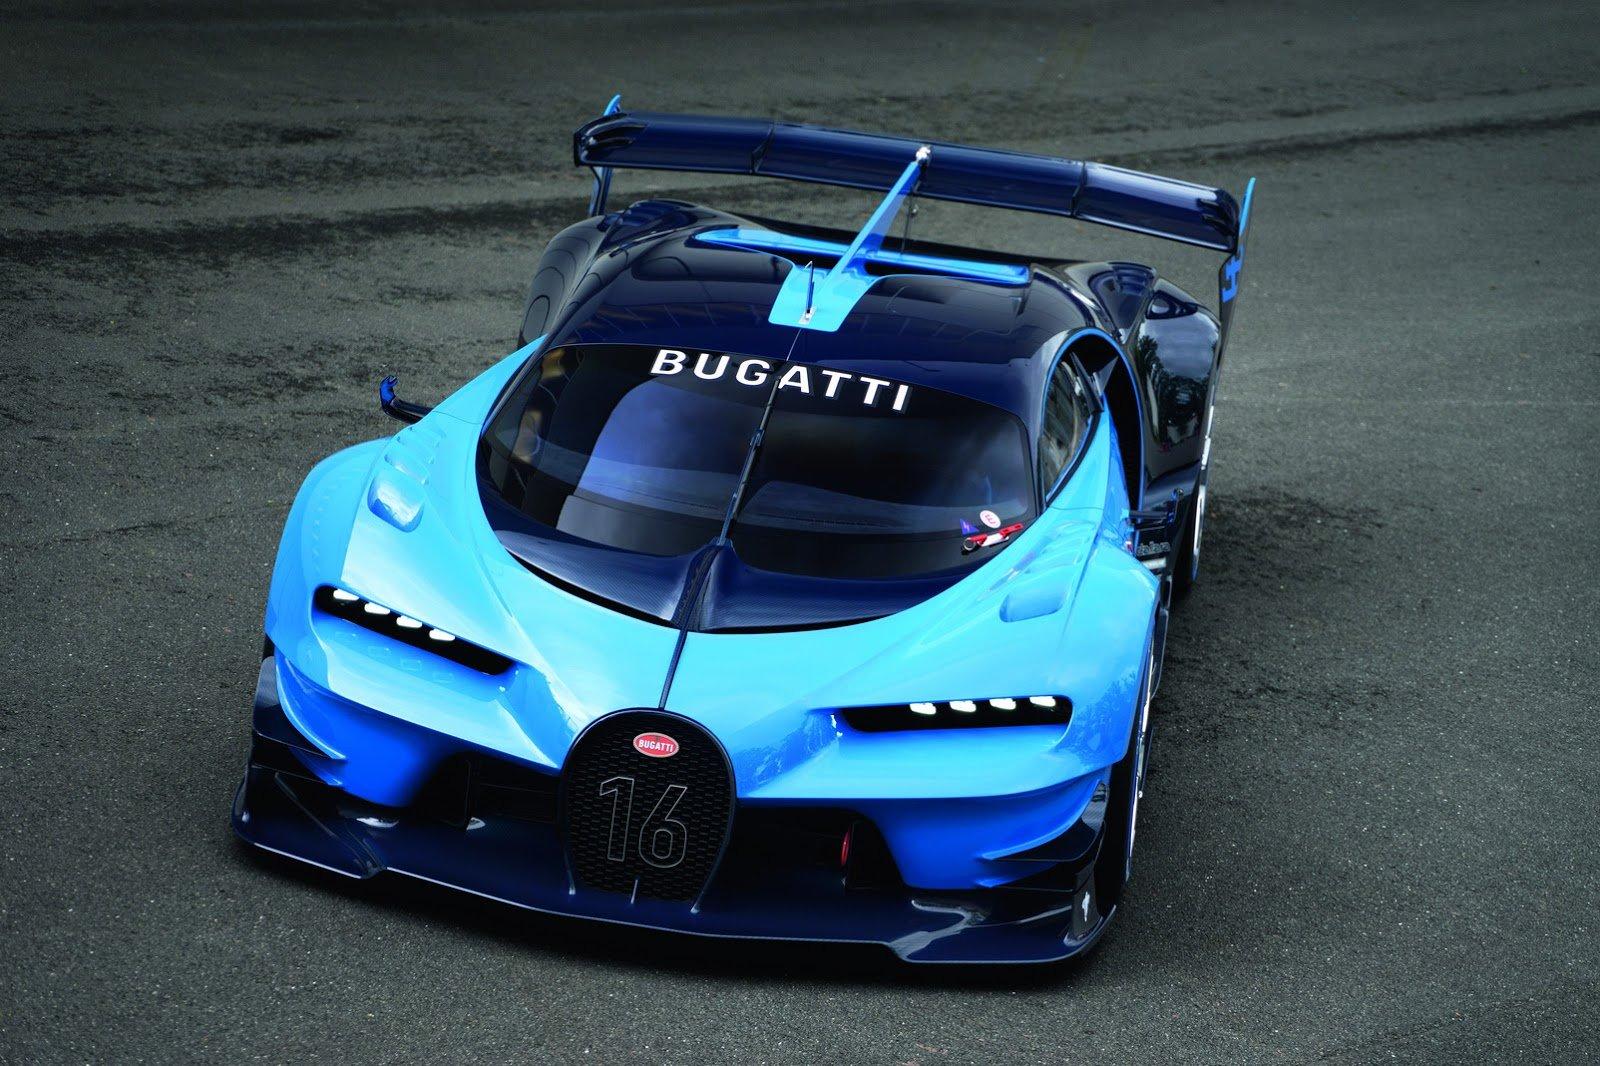 Bugatti построит гиперкар Chiron Divo за 5 млн евро